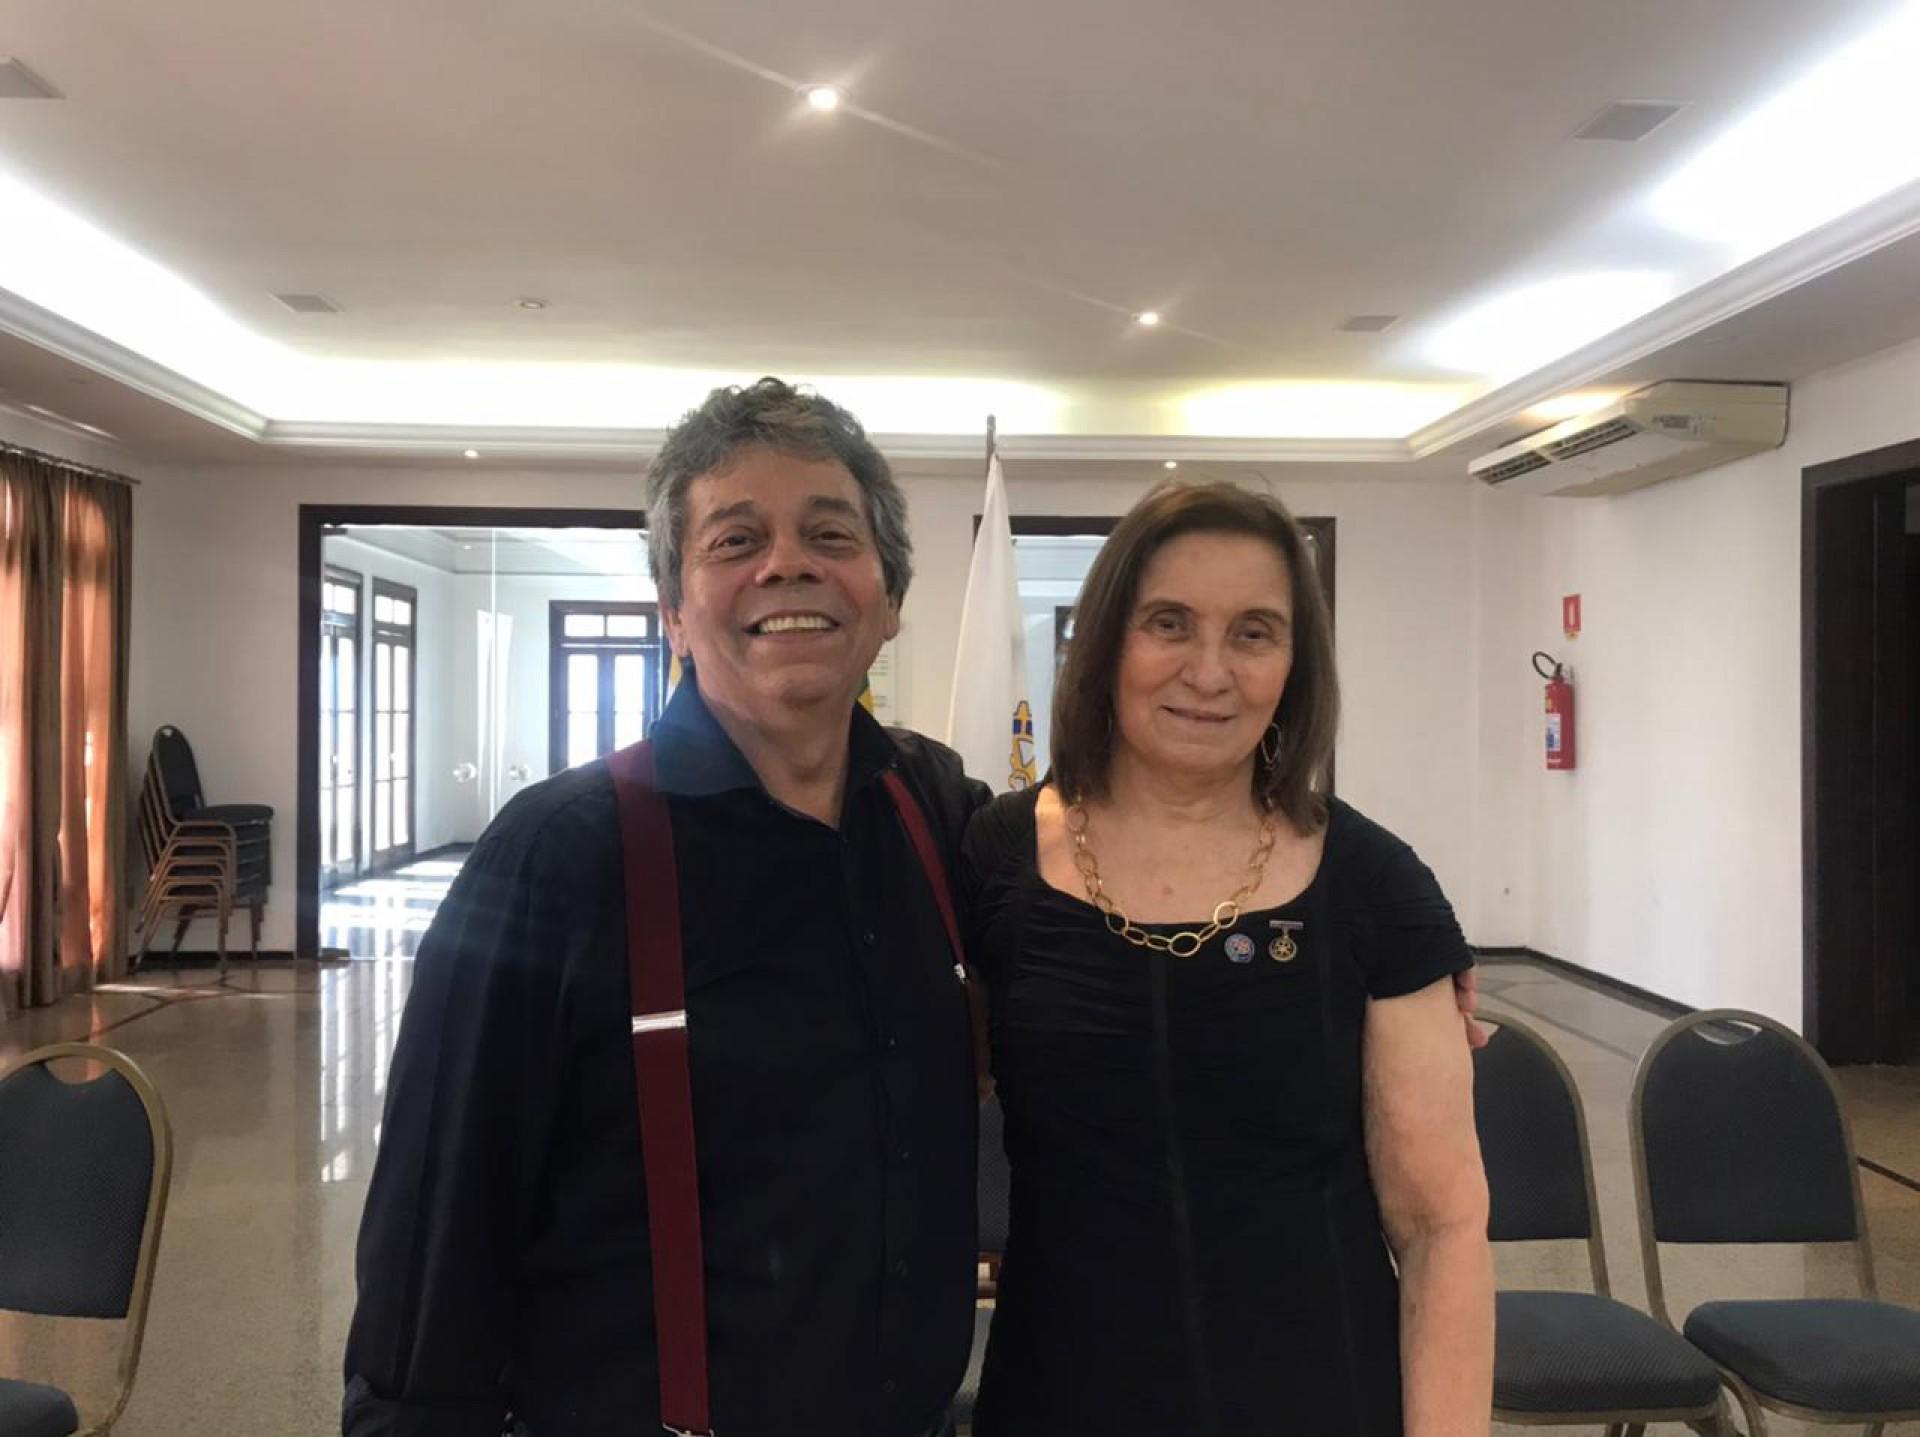 Edite, atual presidente, e Paulo Roberto Uchôa do Amaral, futuro presidente 2022/23